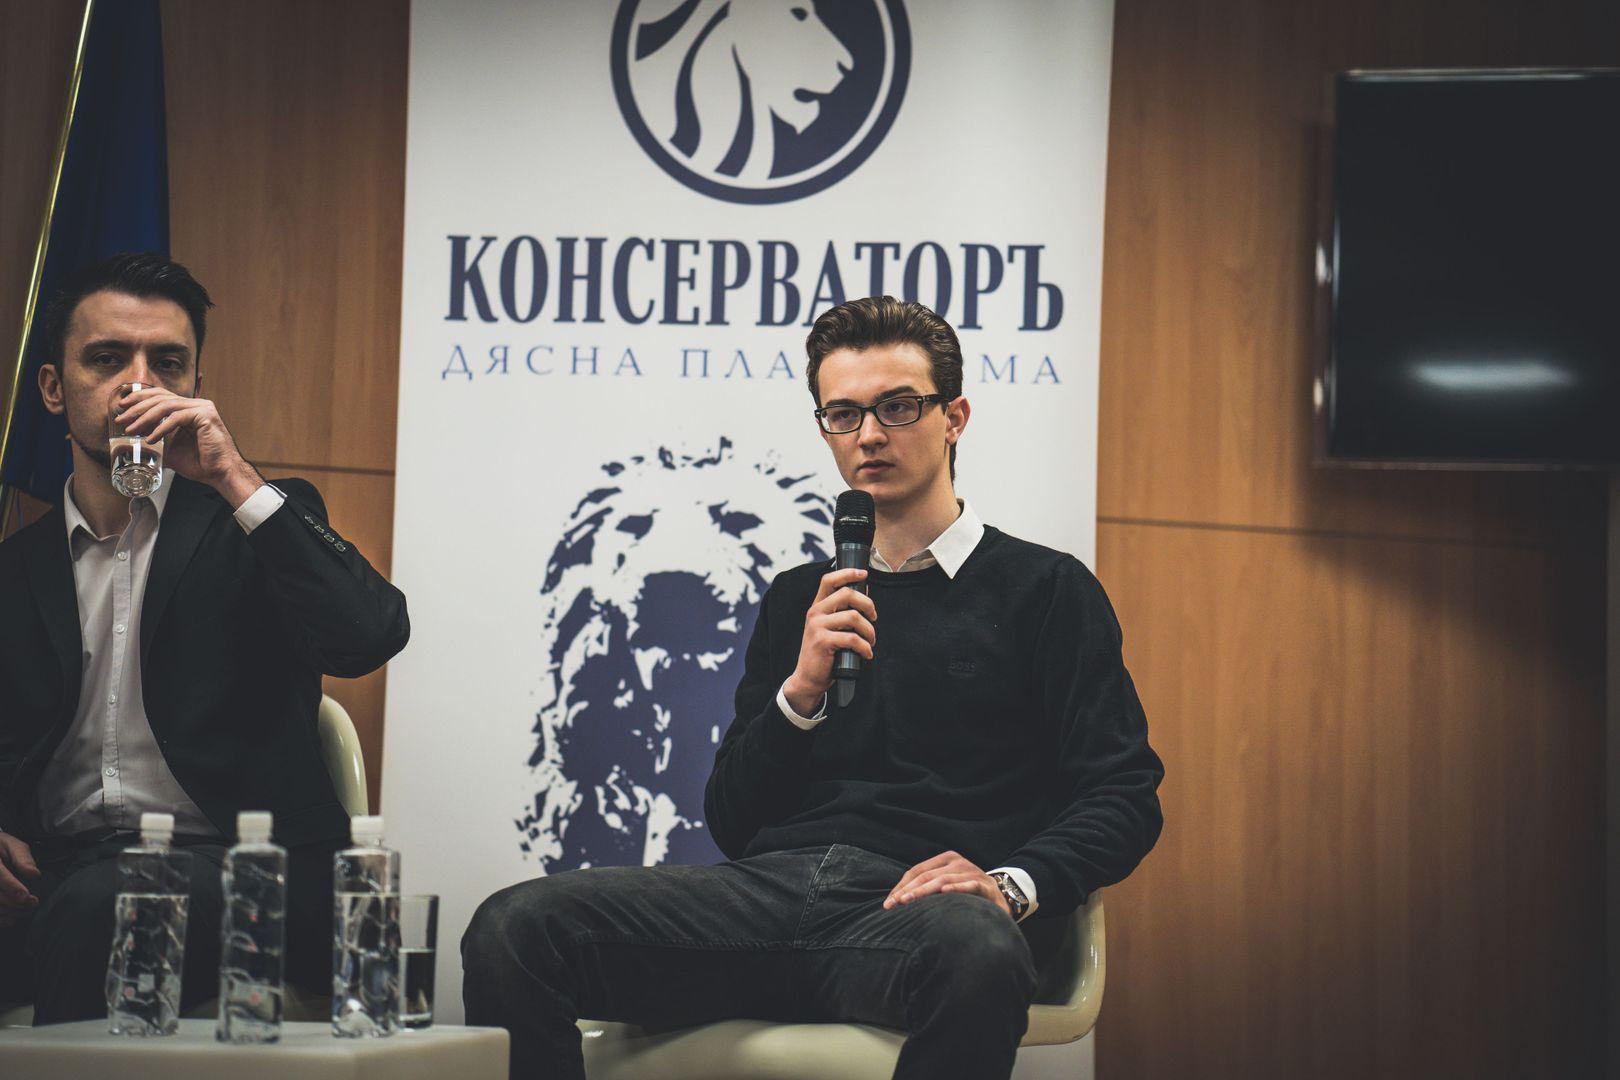 conservative-millenium-strongeurope-event-april-22